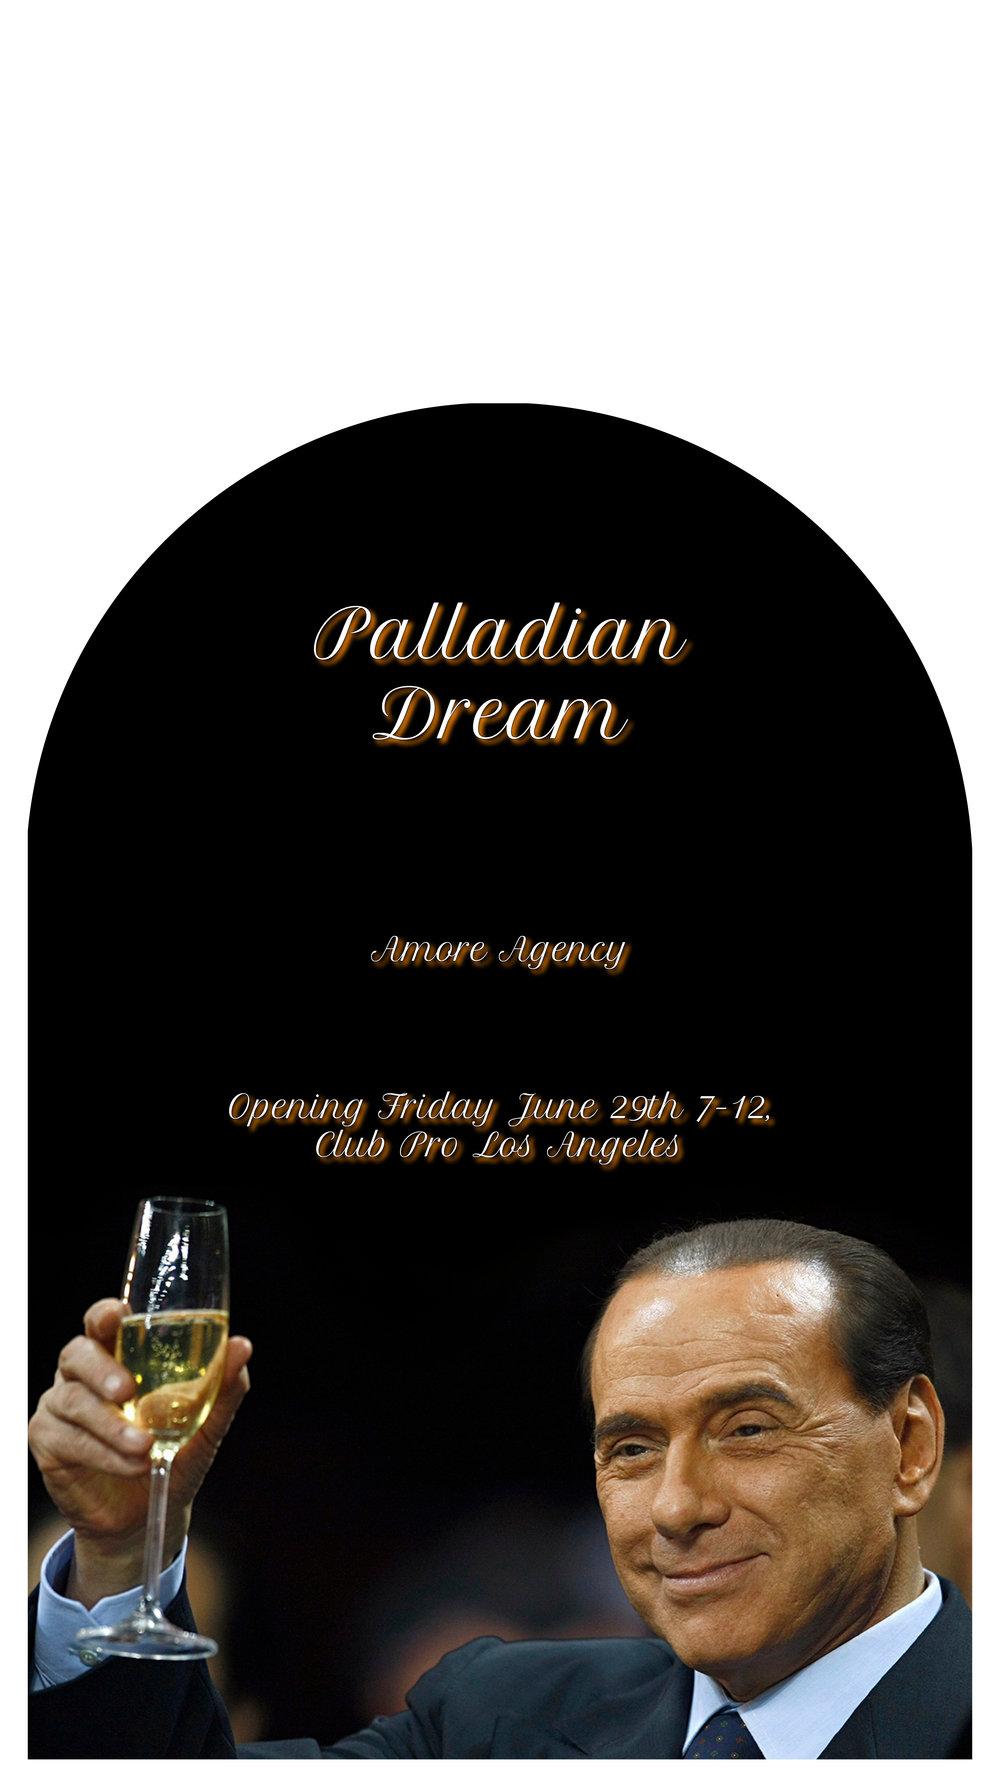 PalladianDream_AA.jpg